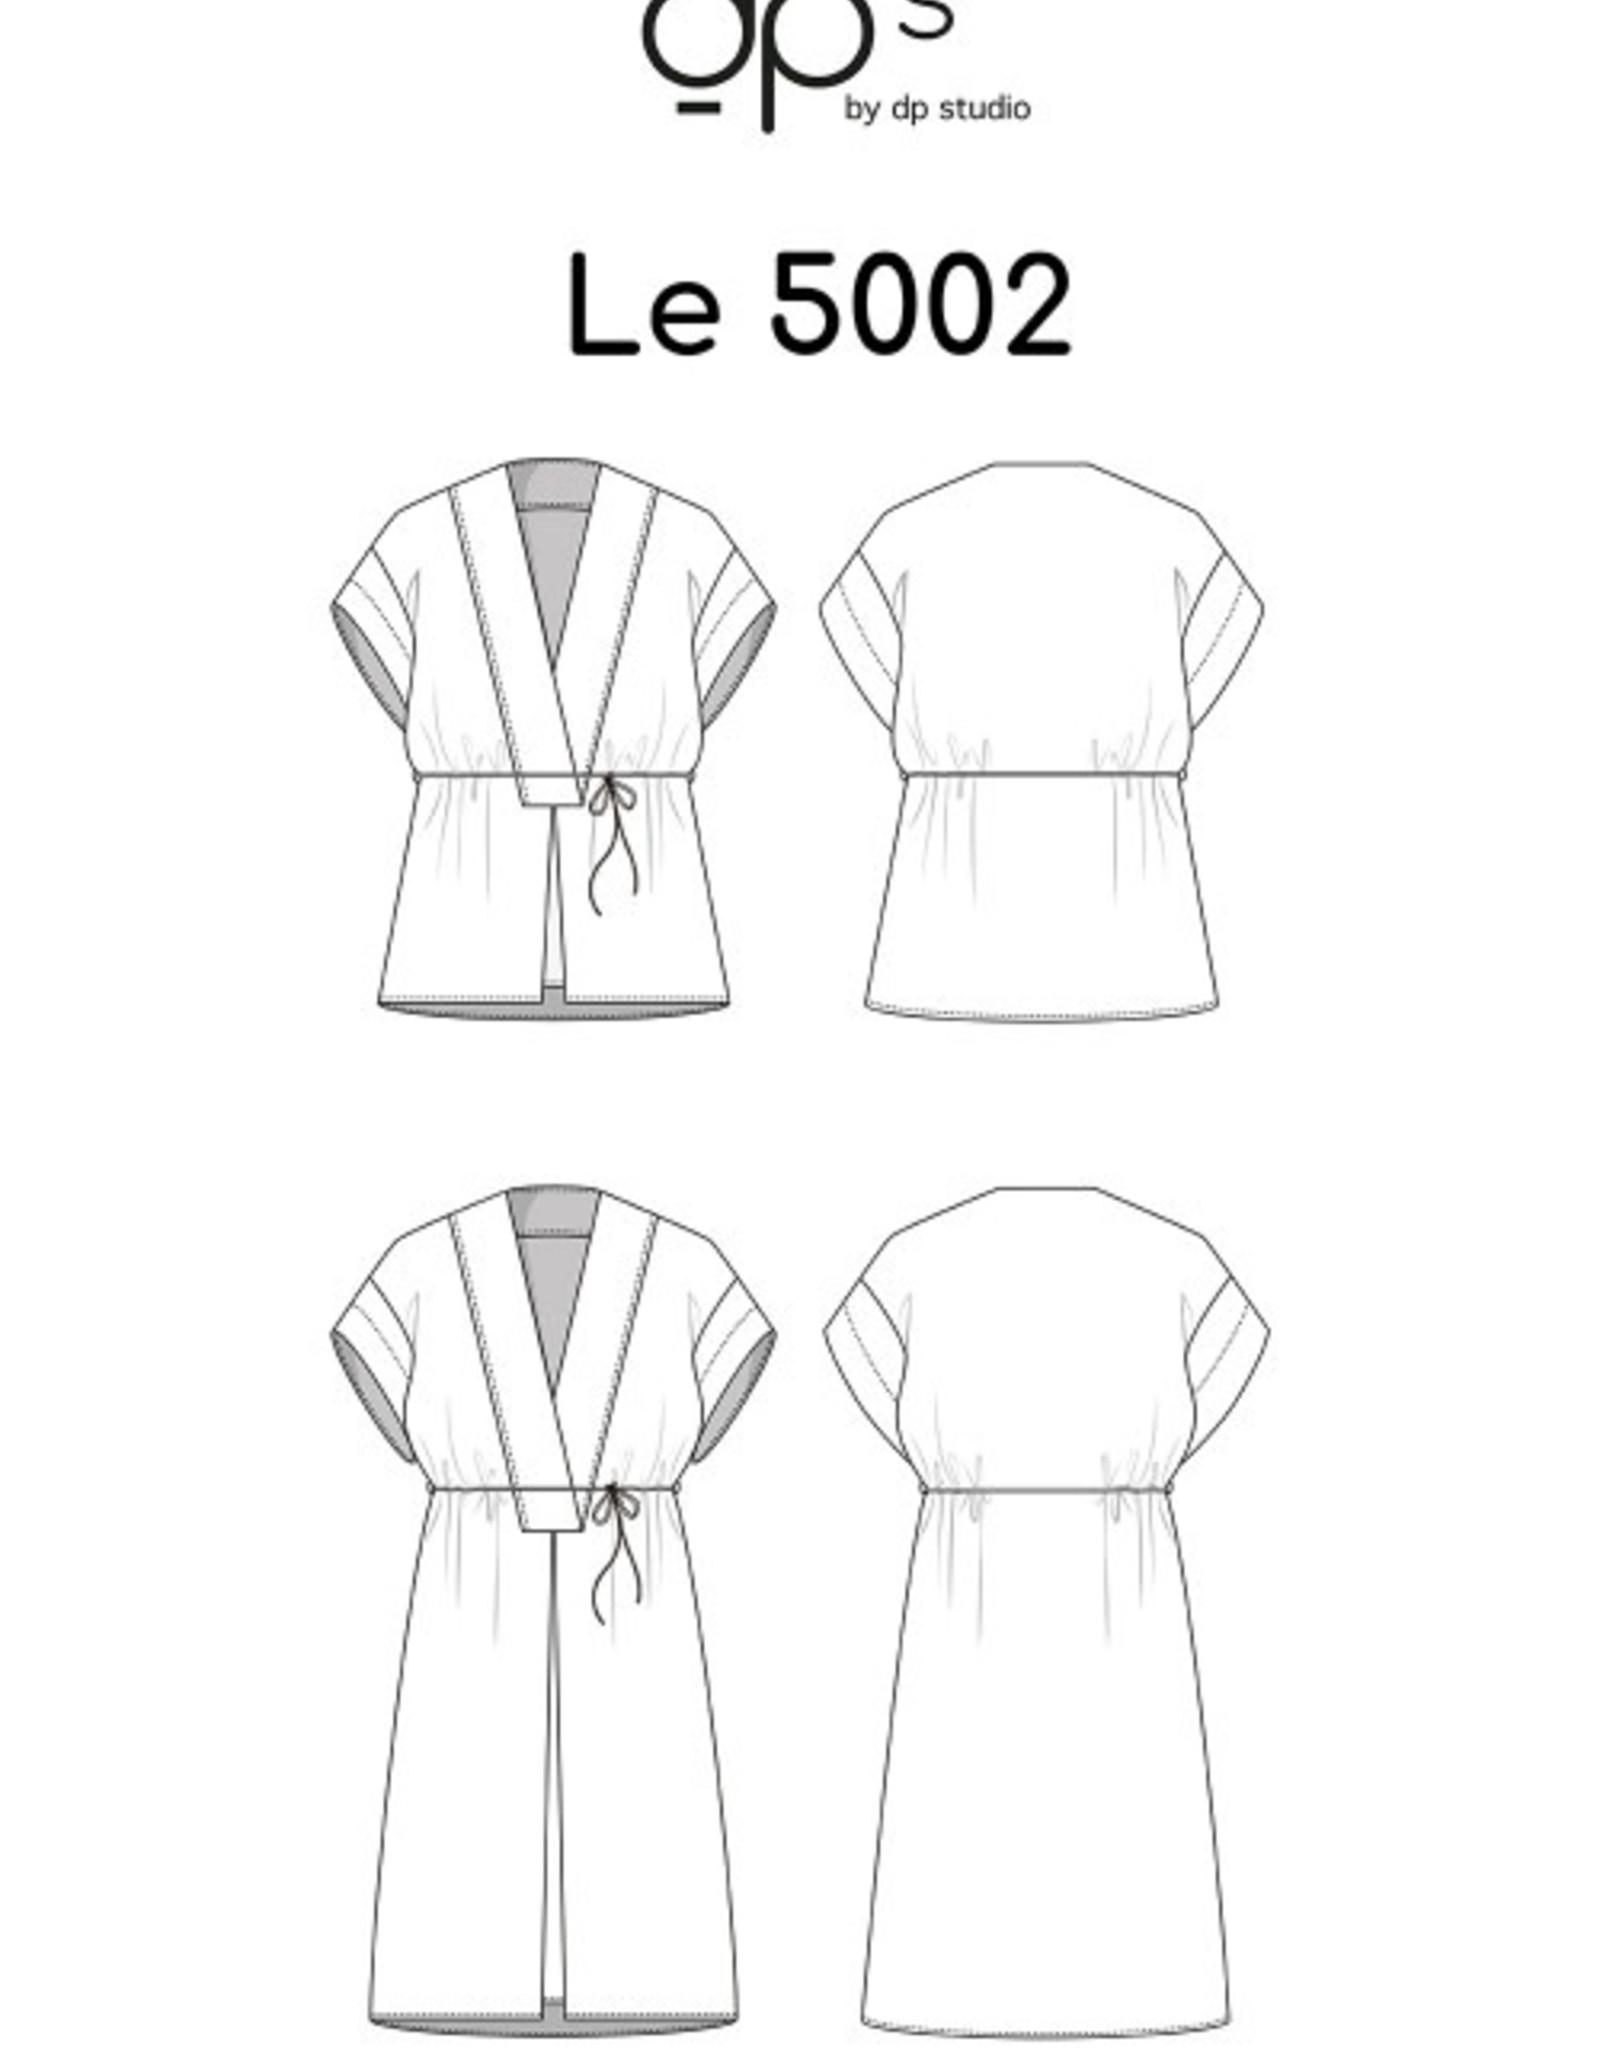 DP Studio Le 5002 Tuniek/jurk